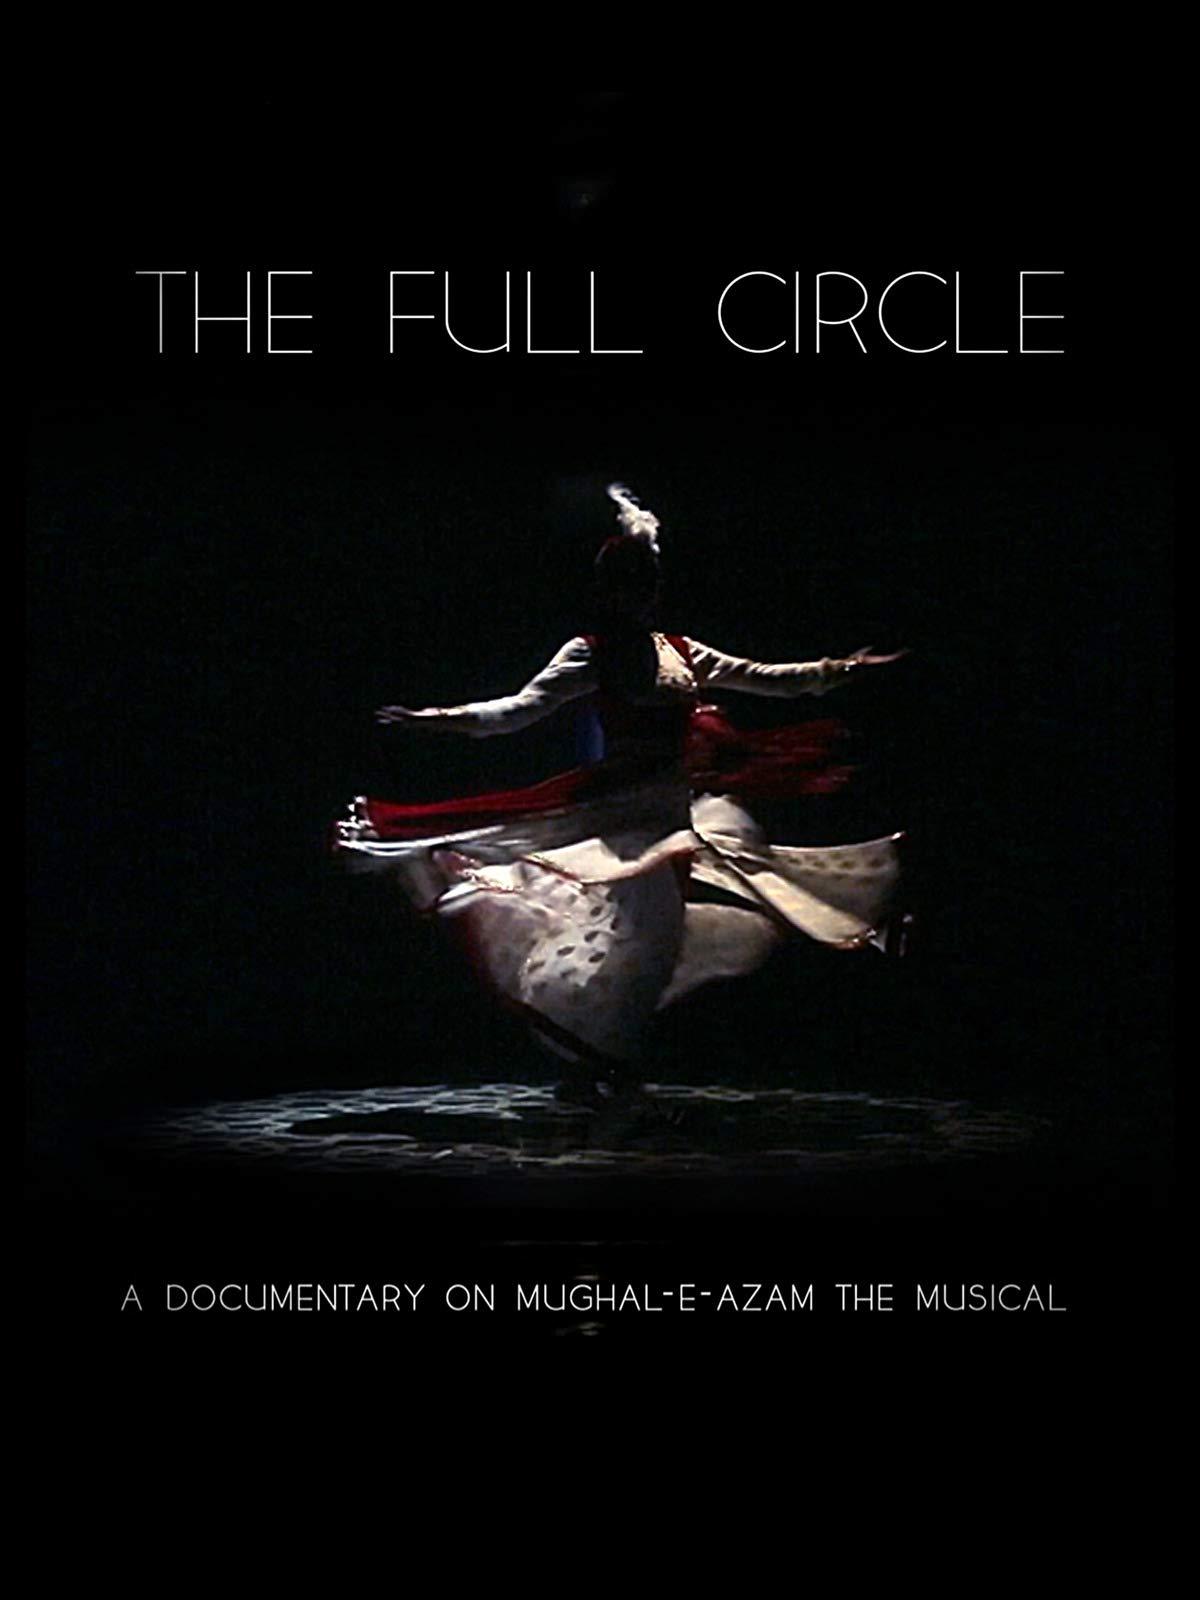 The Full Circle- A Documentary on Mughal-E-Azam The Musical